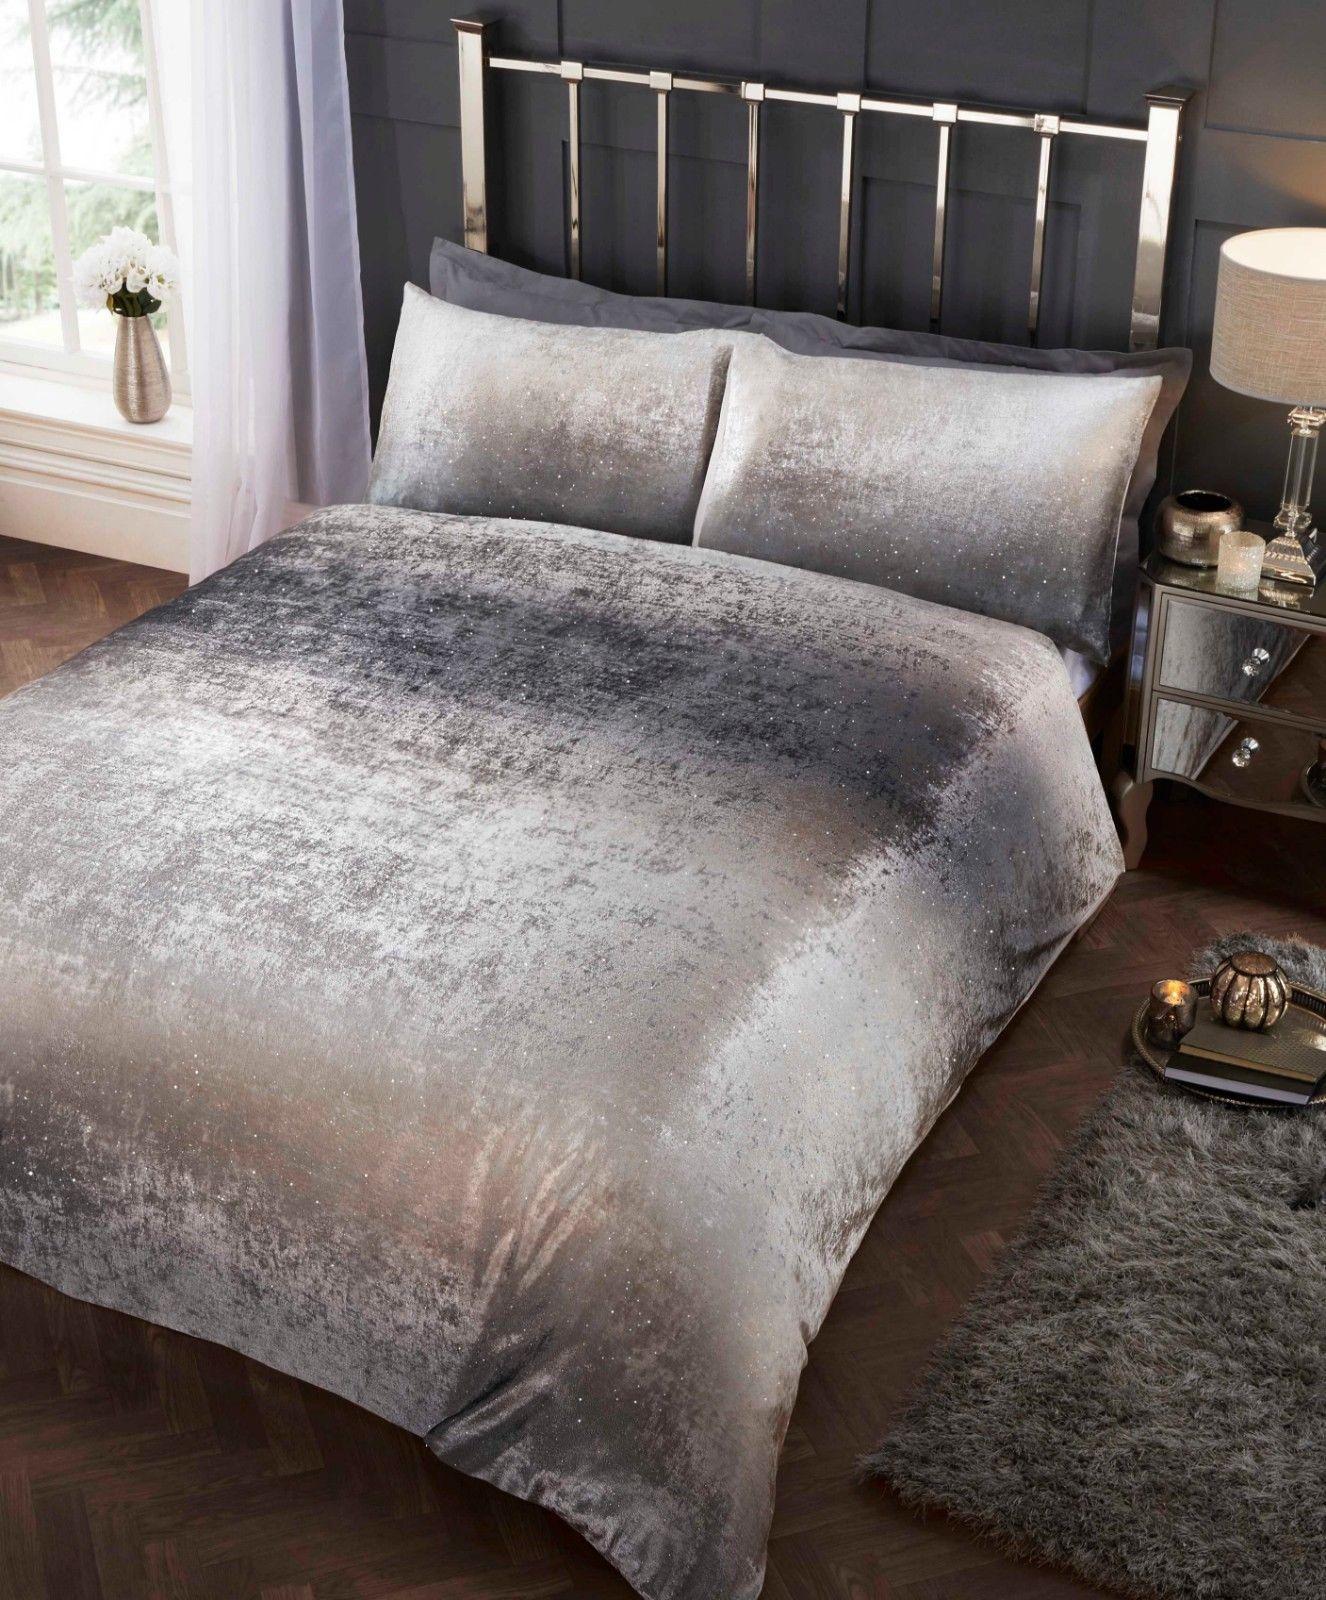 320b21a7b5ded Rapport Crushed Velvet Stardust Shimmer Duvet Cover Bedding Set Silver/Grey.  £24.99 ...